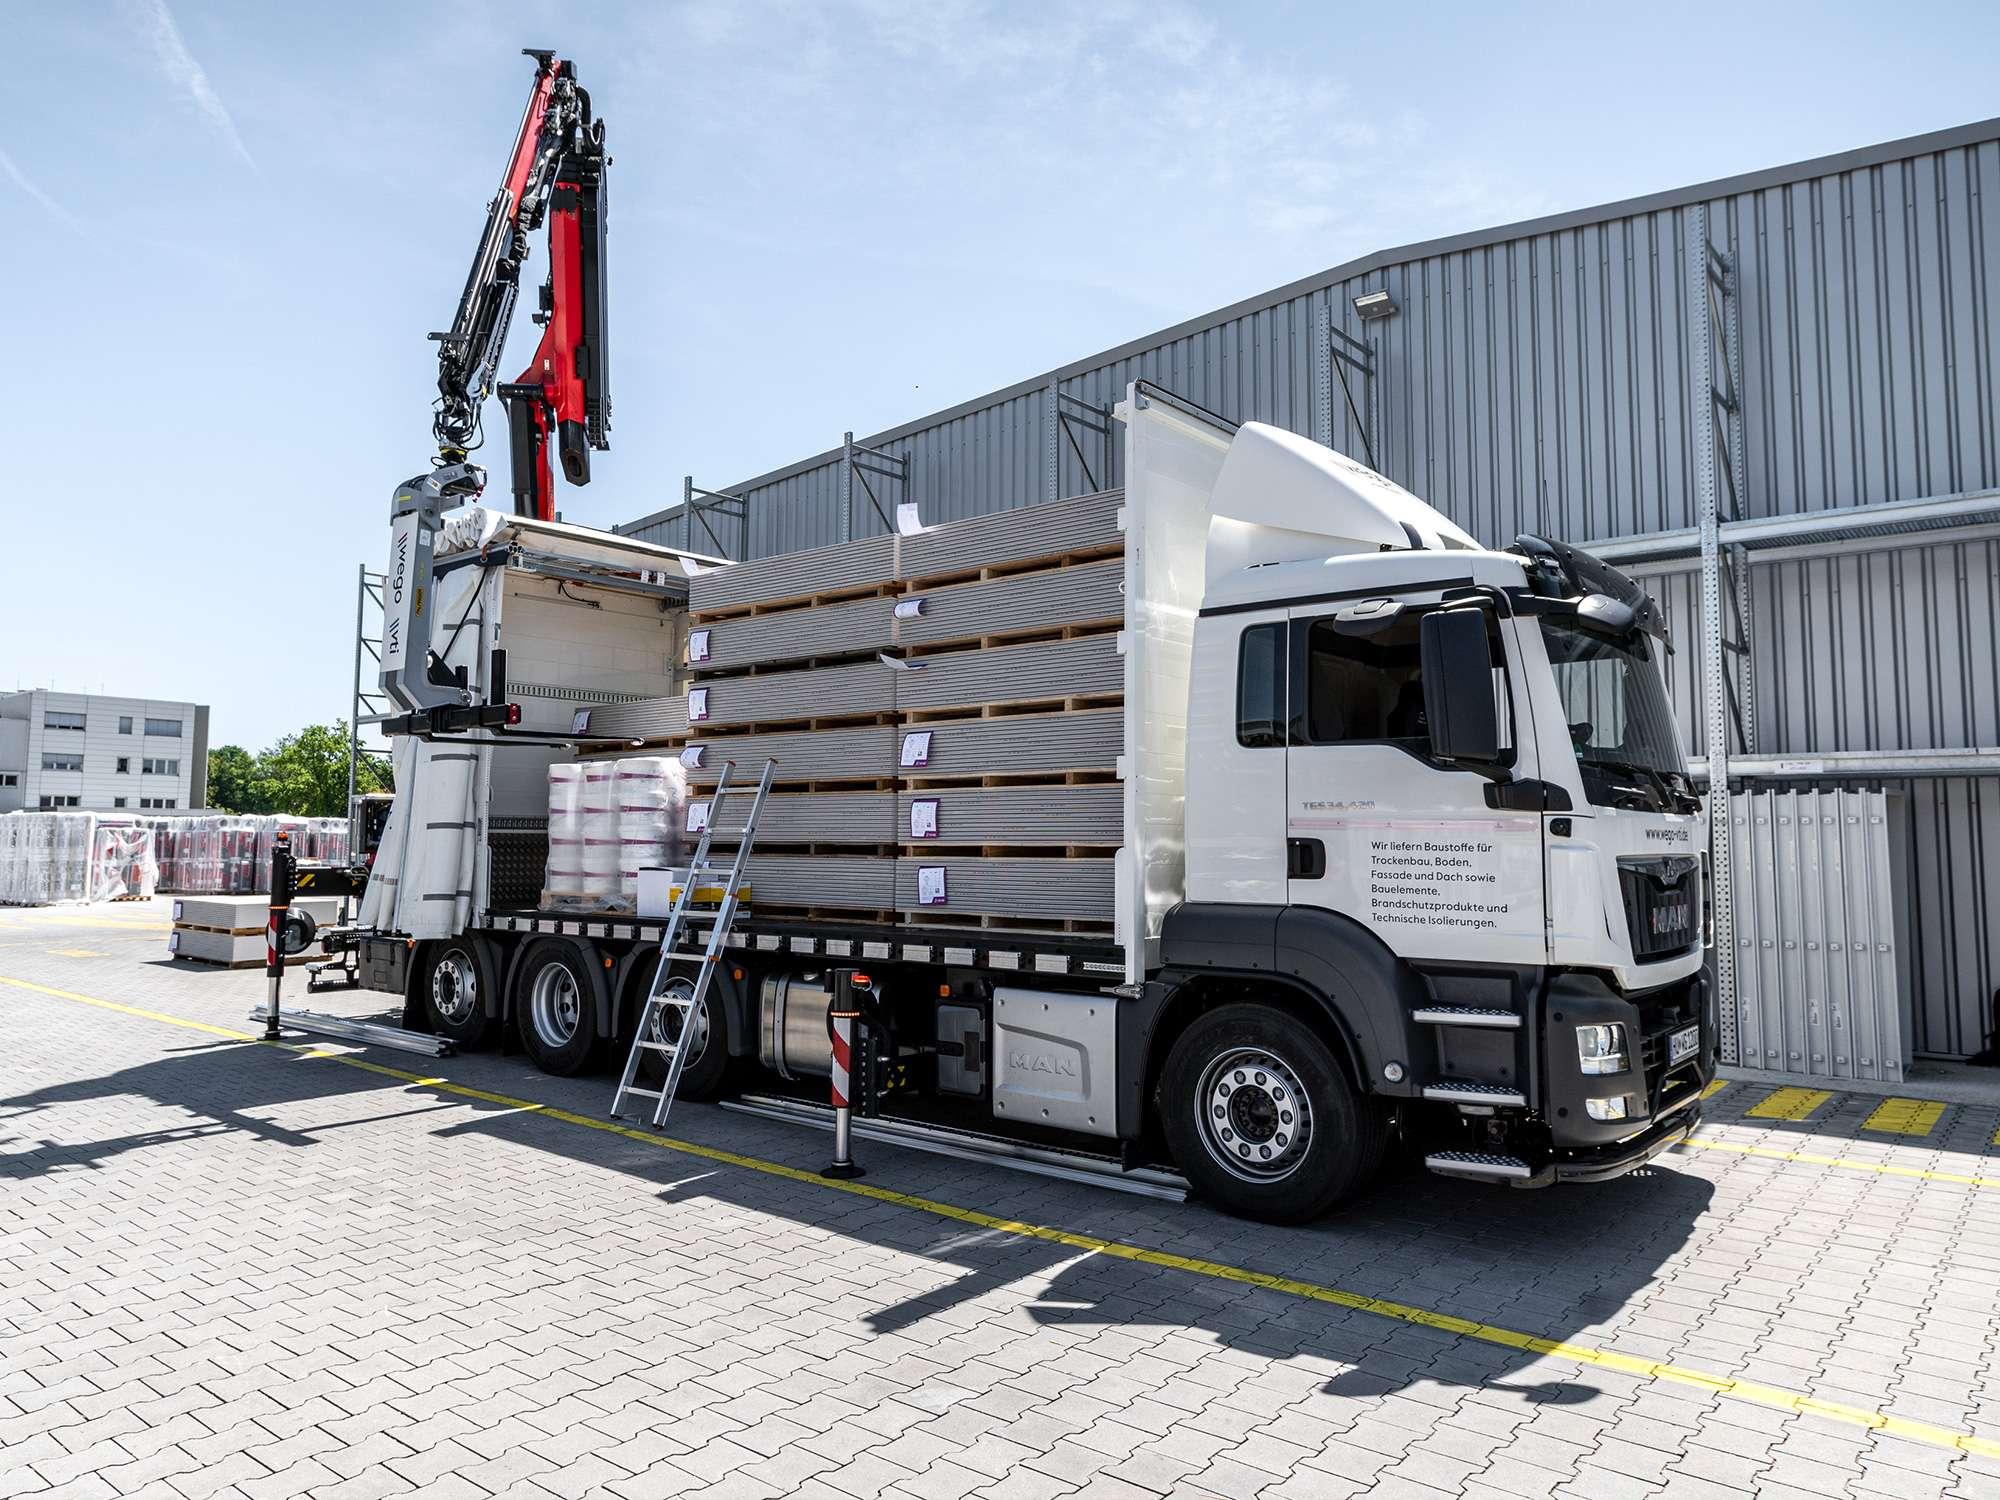 btb-wego-fahrzeugflotte-4